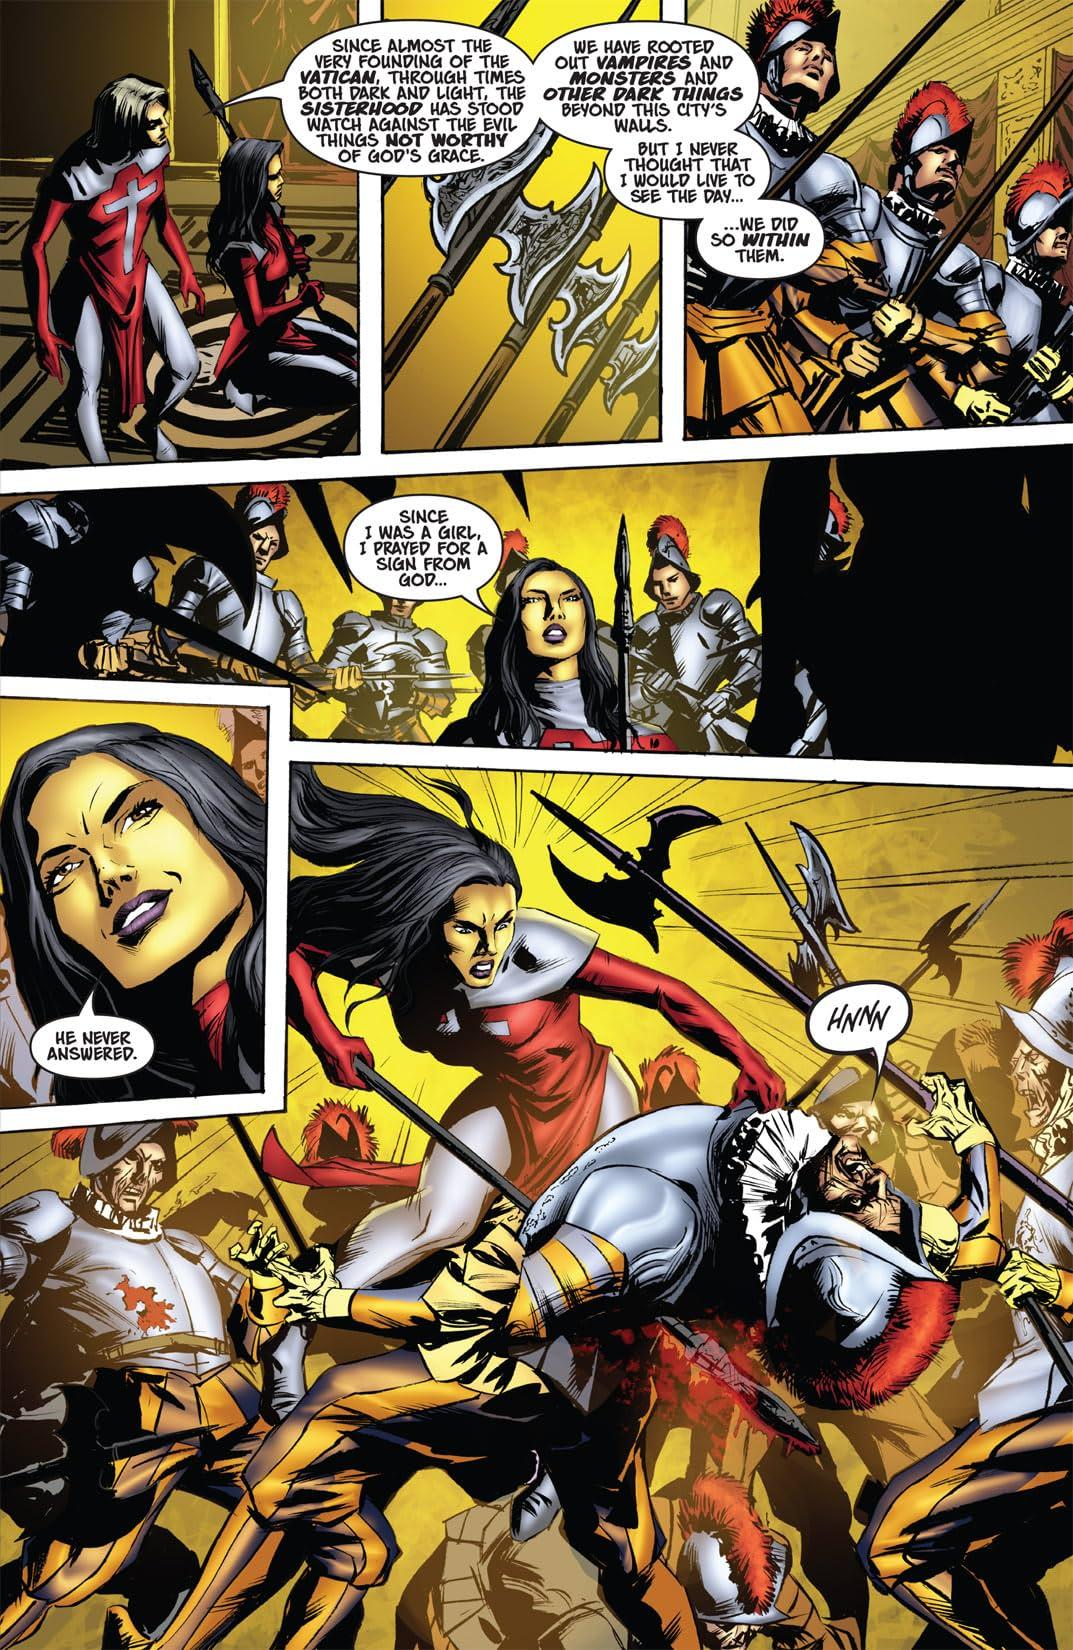 Vampirella and the Scarlet Legion #4